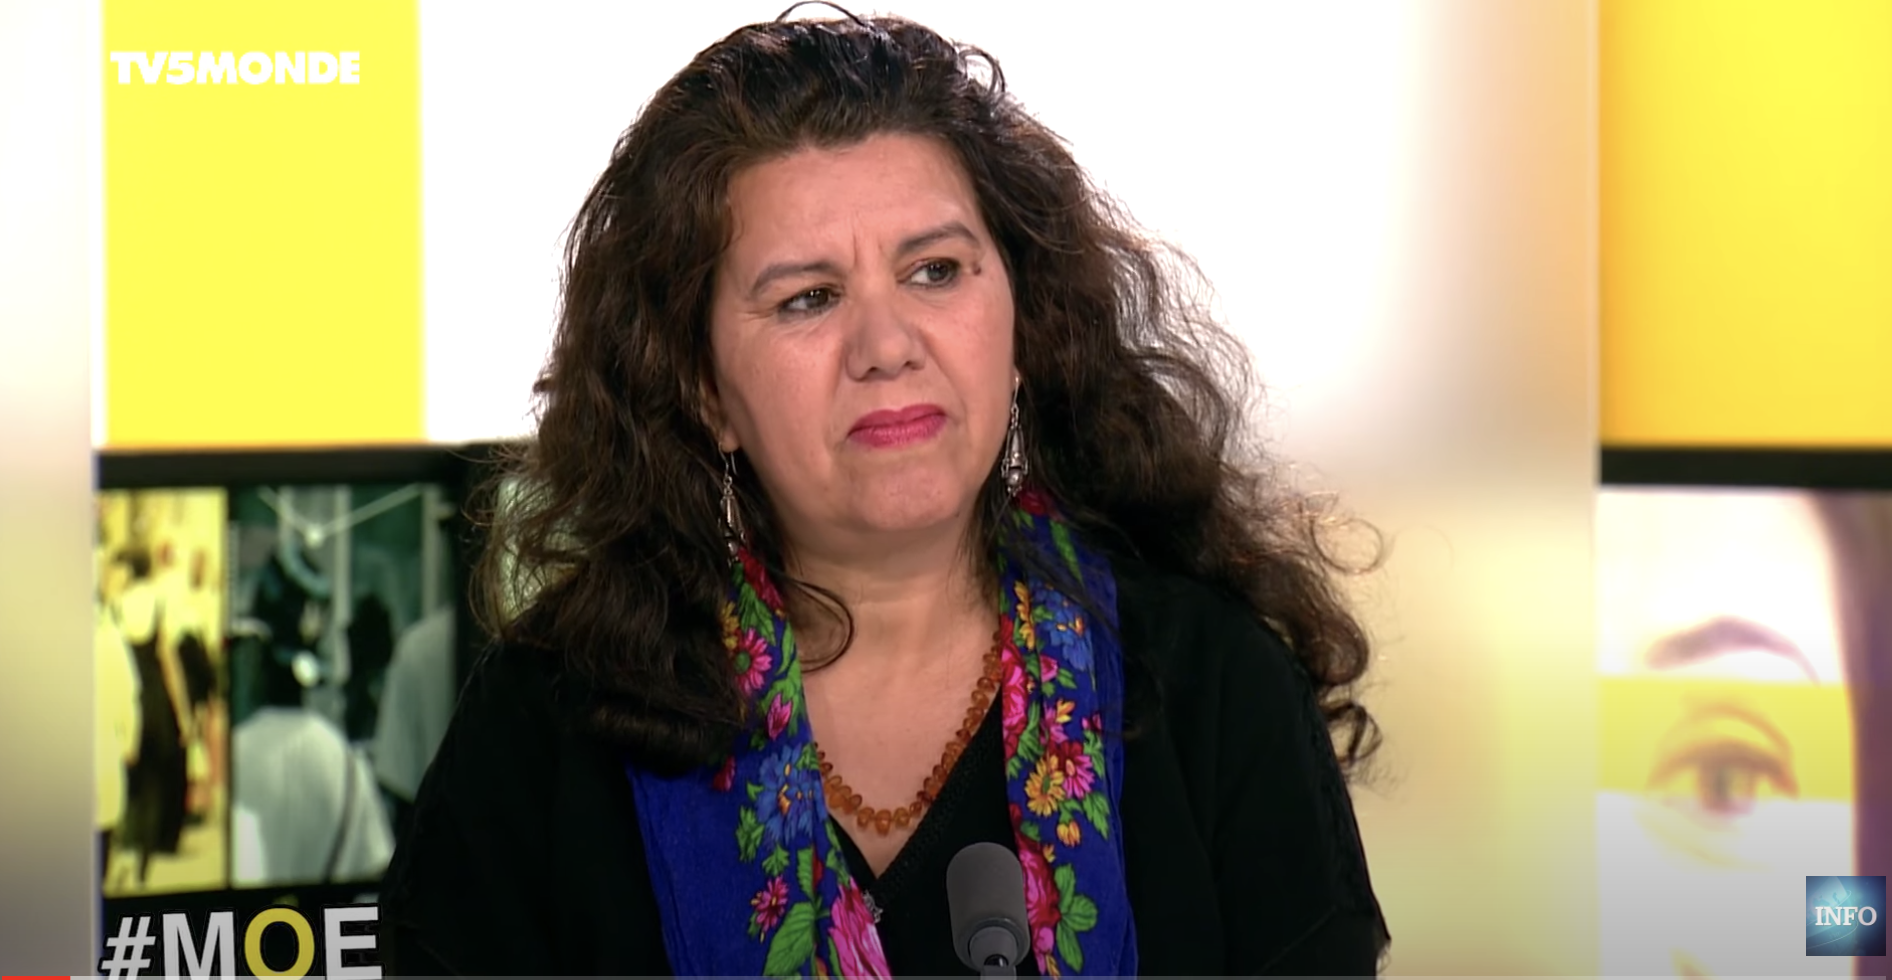 Algérie : Kateb Yacine m'a reconnectée – Rahma Benhamou El Madani